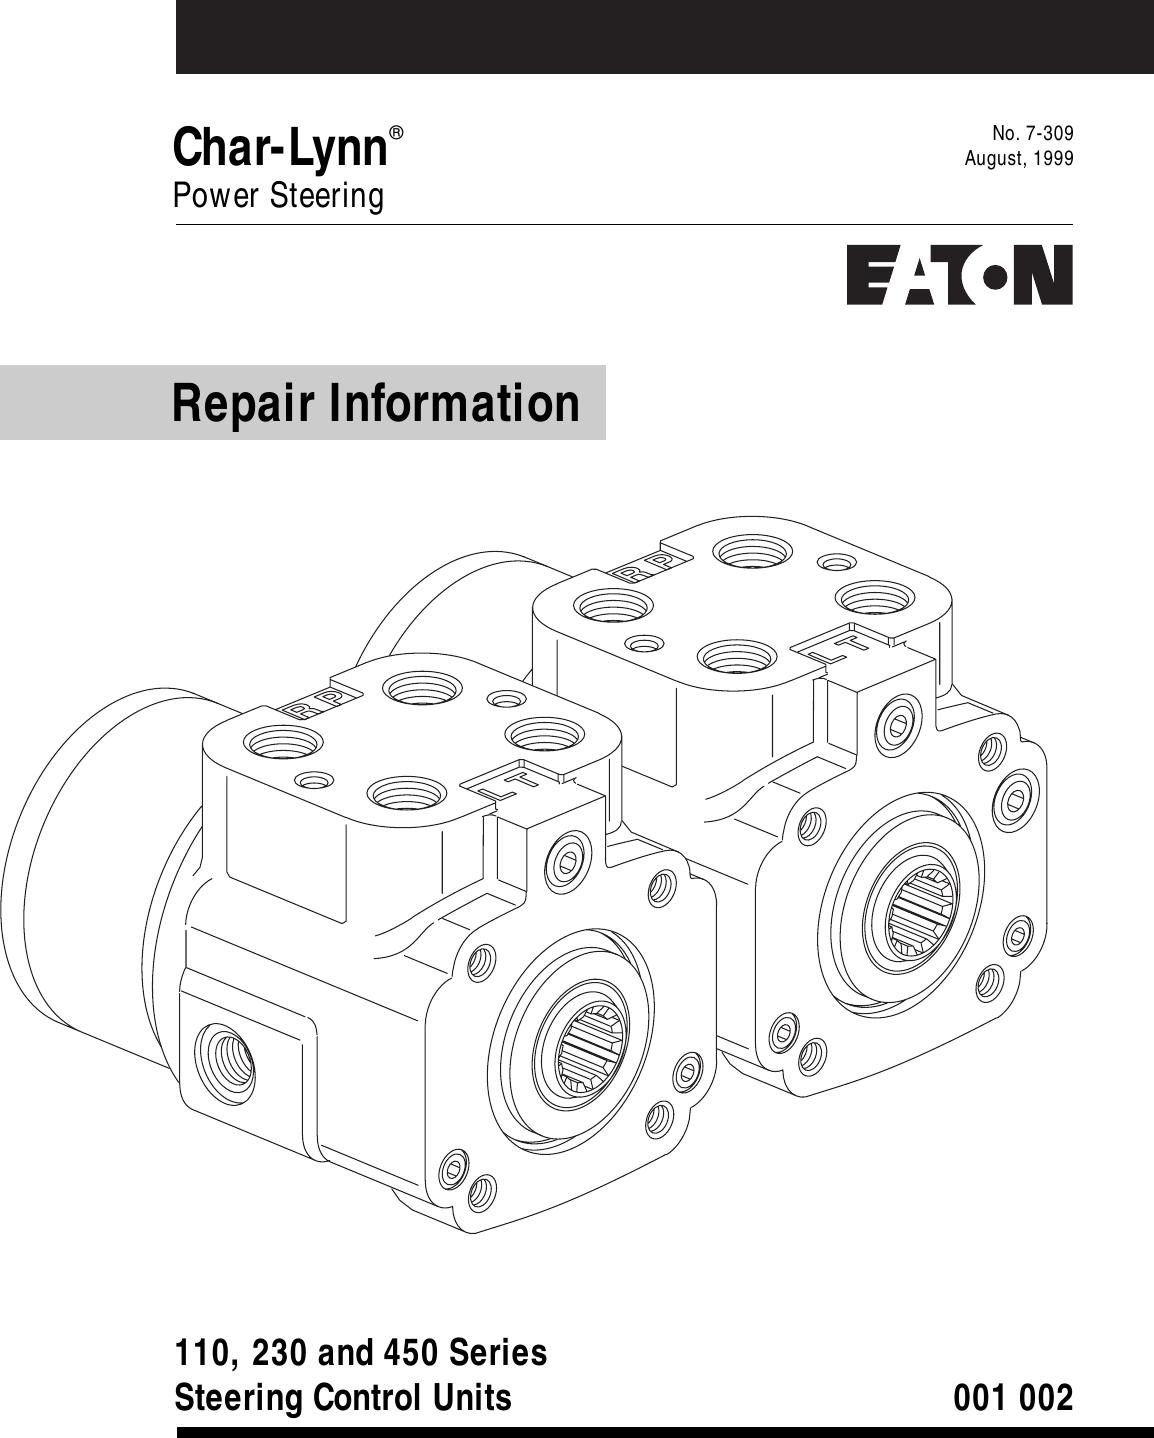 Eaton Electrical Char Lynn 110 Users Manual 07 309.pm6